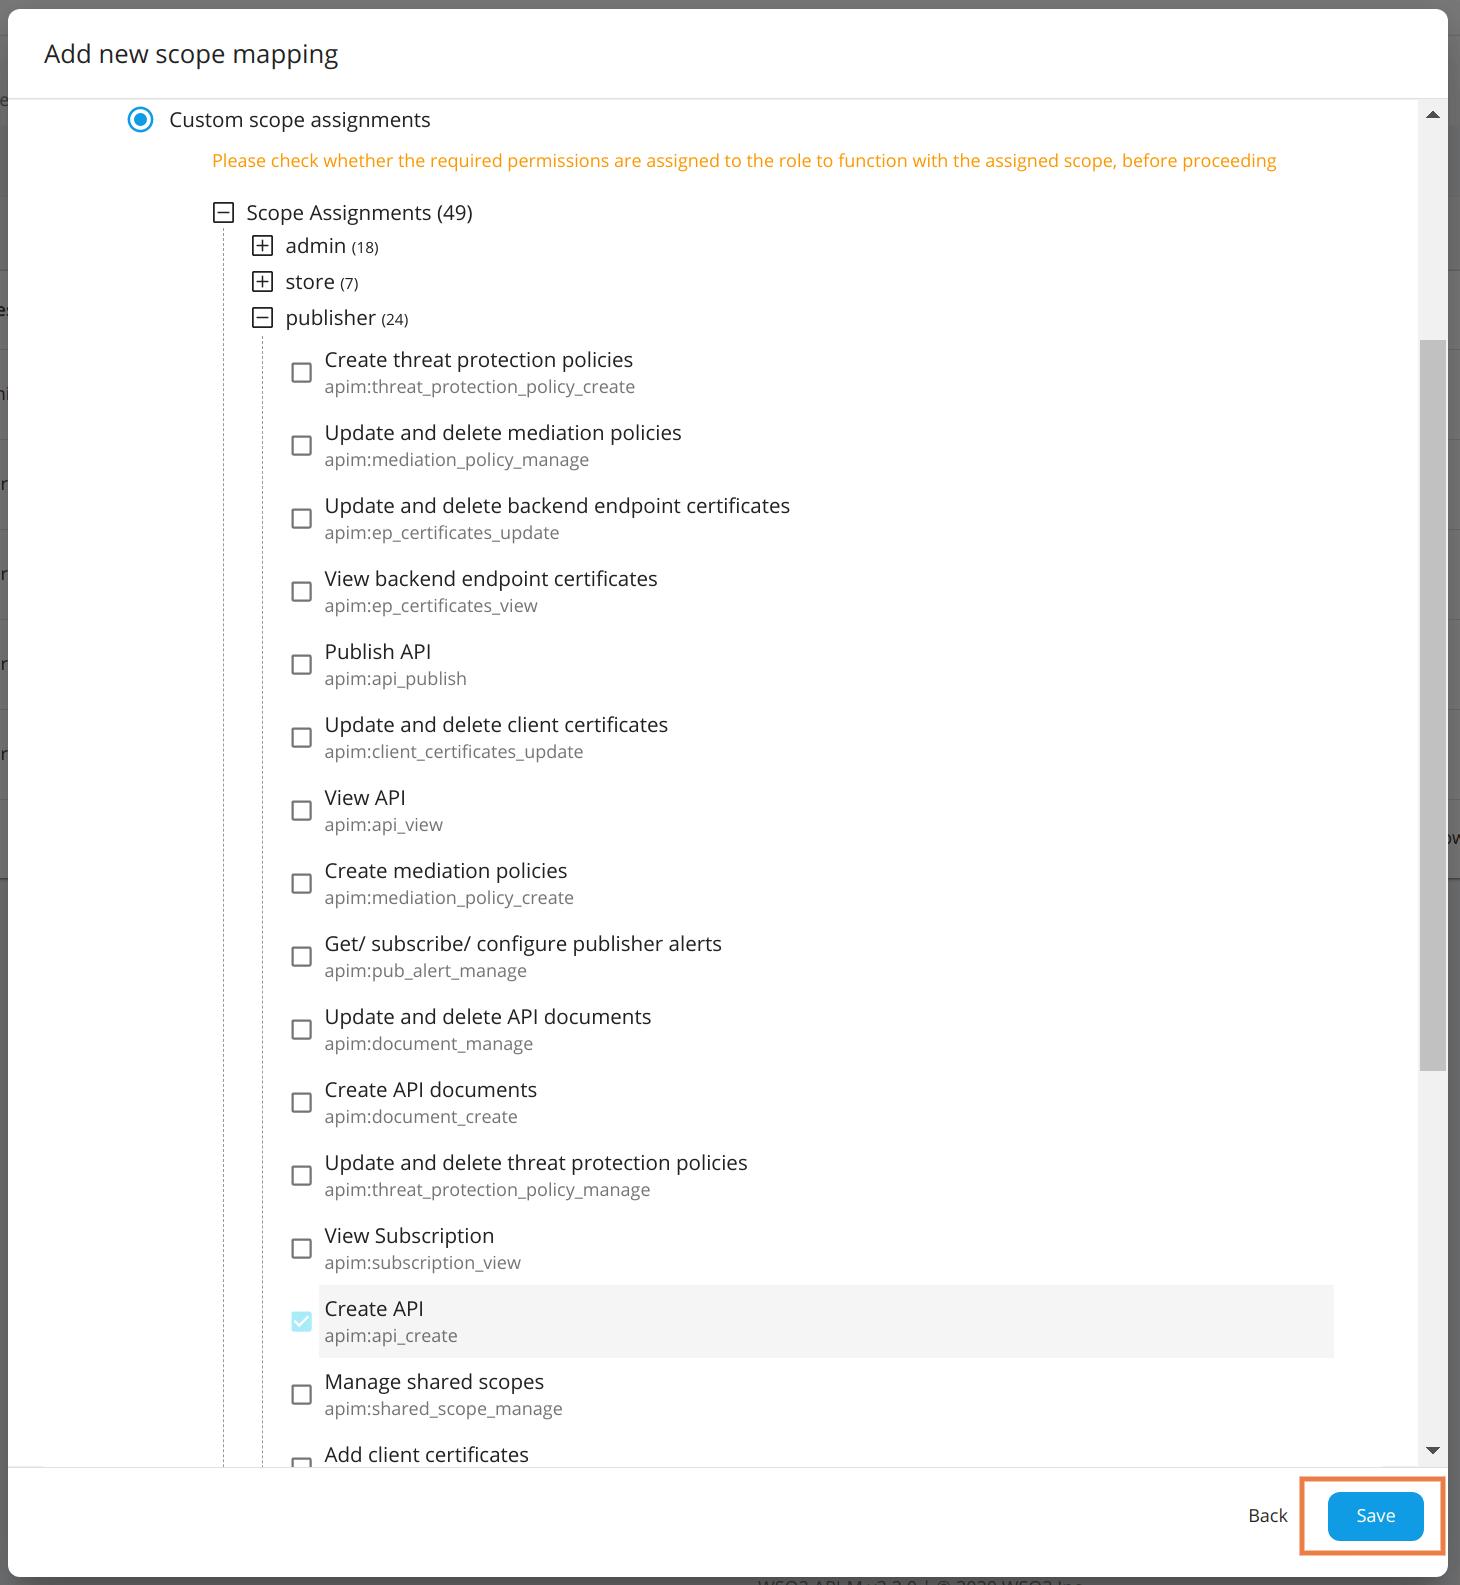 Add Custom Scope Mapping